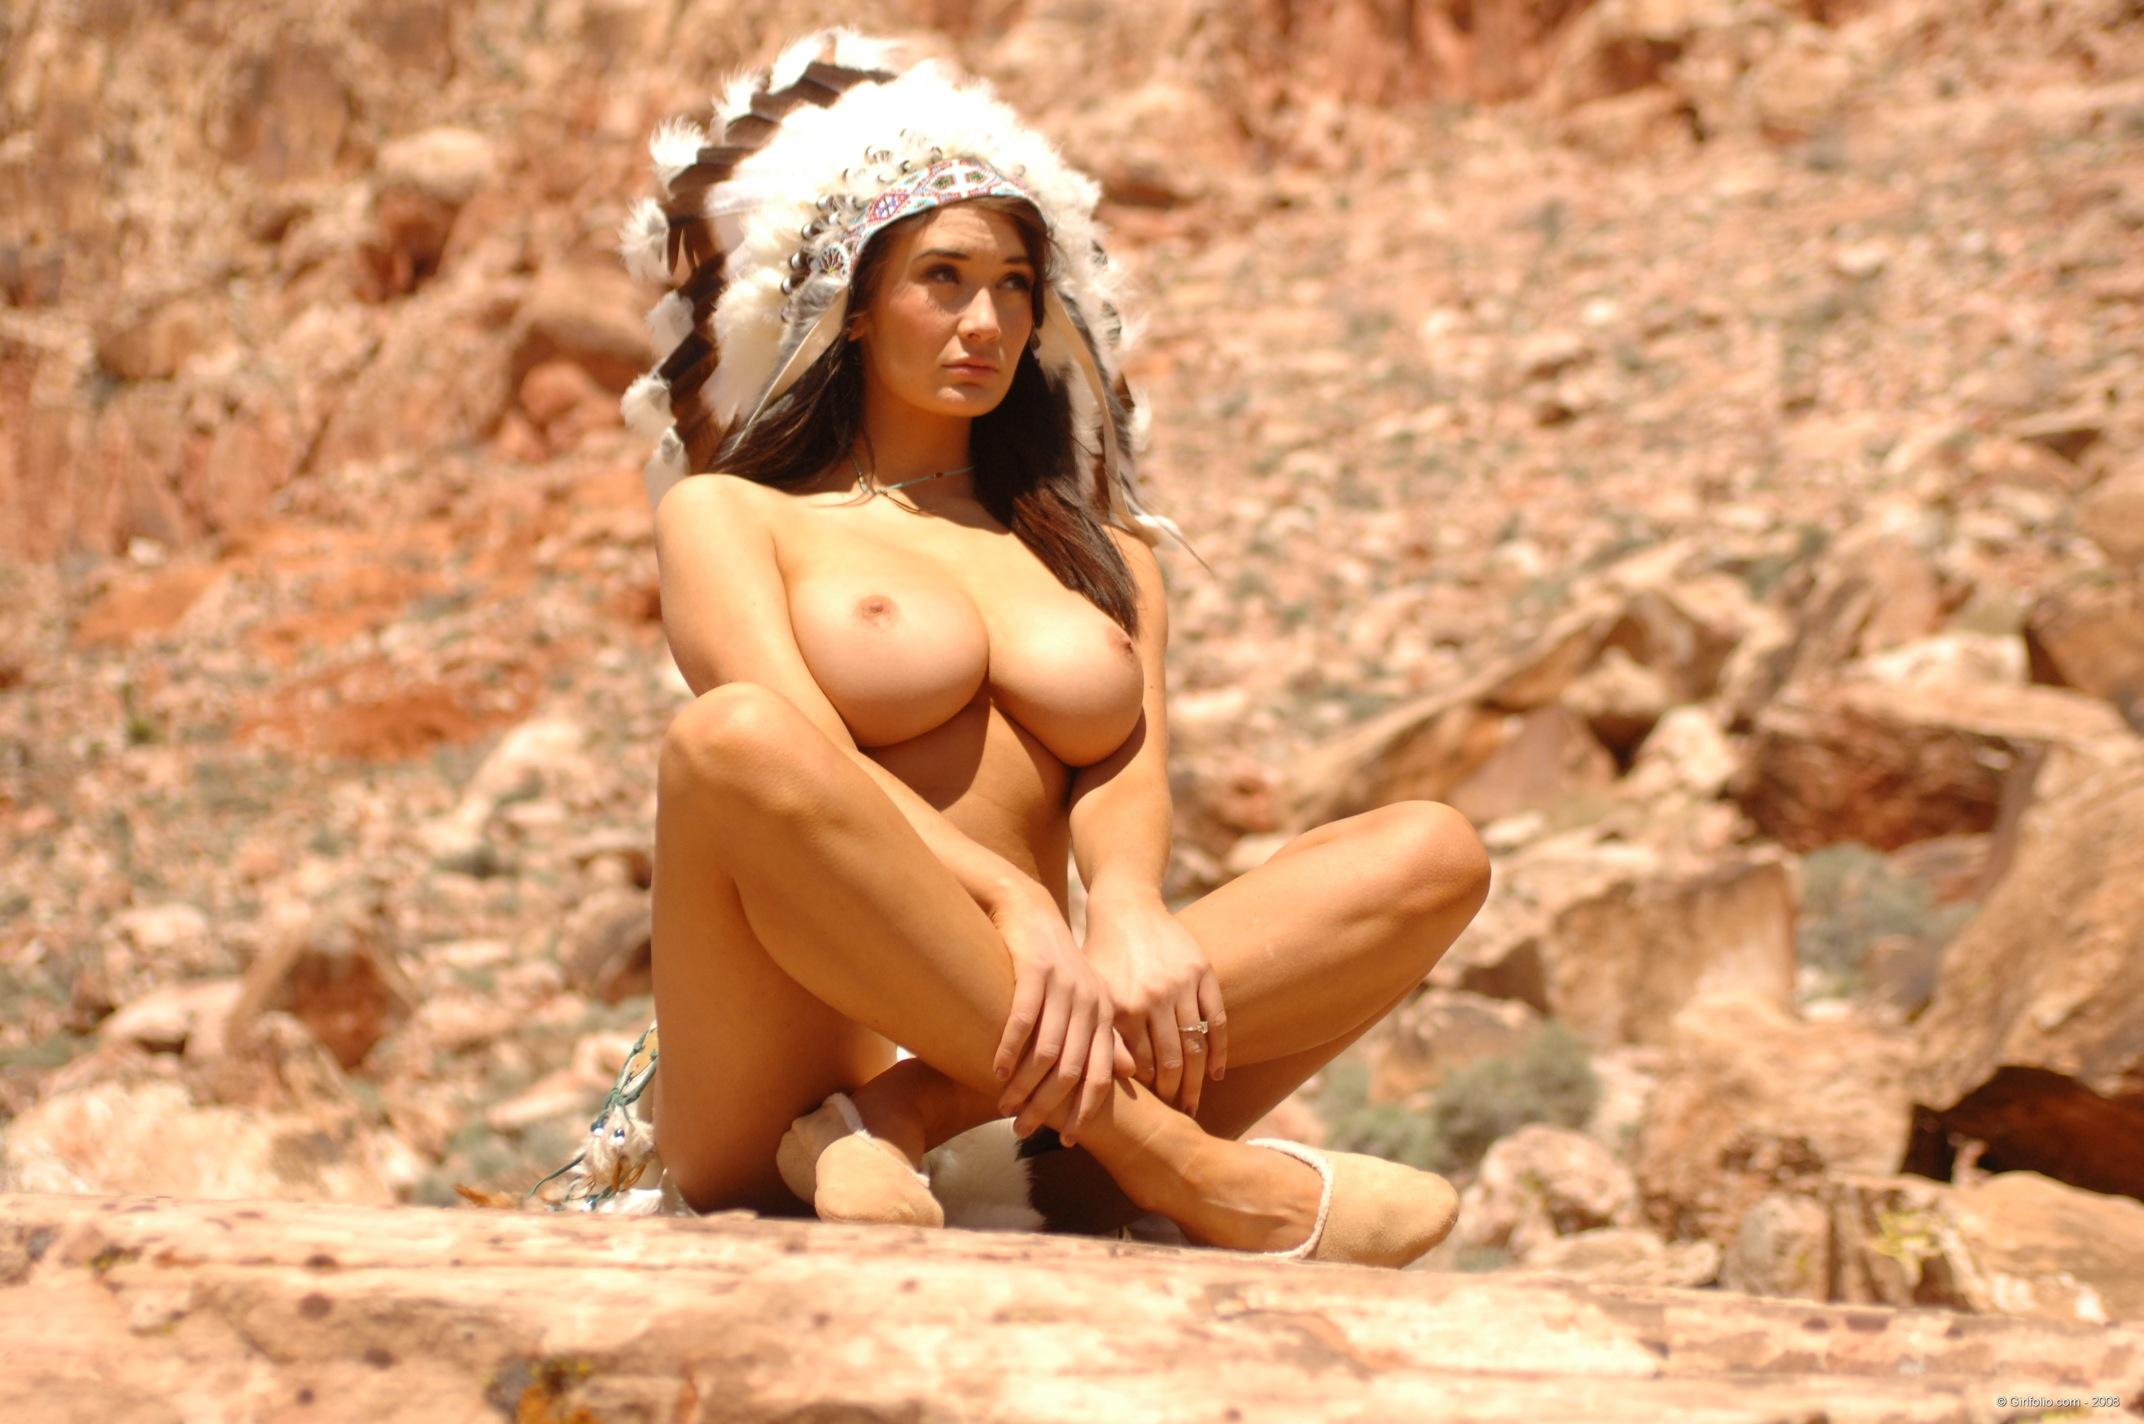 Hot sexy native american women nude